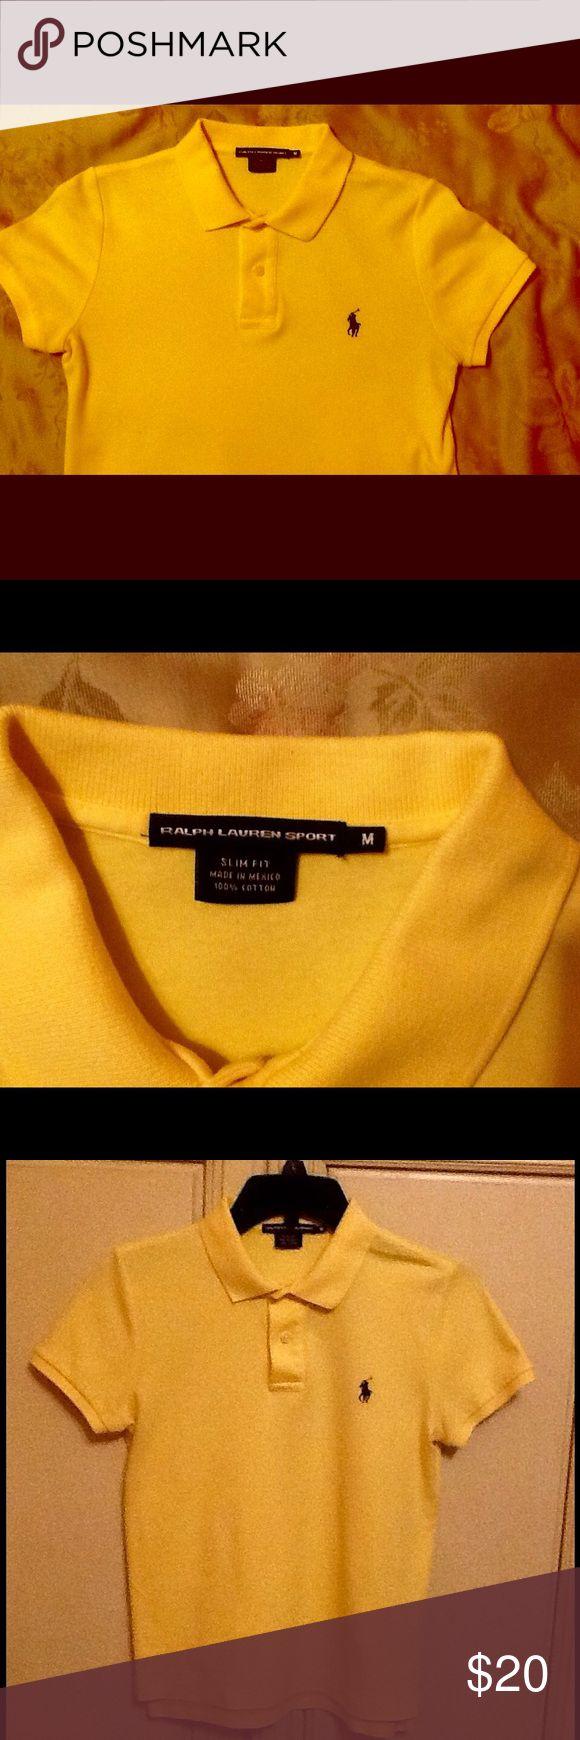 Ralph Lauren Sport polo shirt Yellow colored Ralph Lauren polo shirt with blue polo logo.  Slim fit style.  Excellent condition Ralph Lauren Sport Tops Tees - Short Sleeve